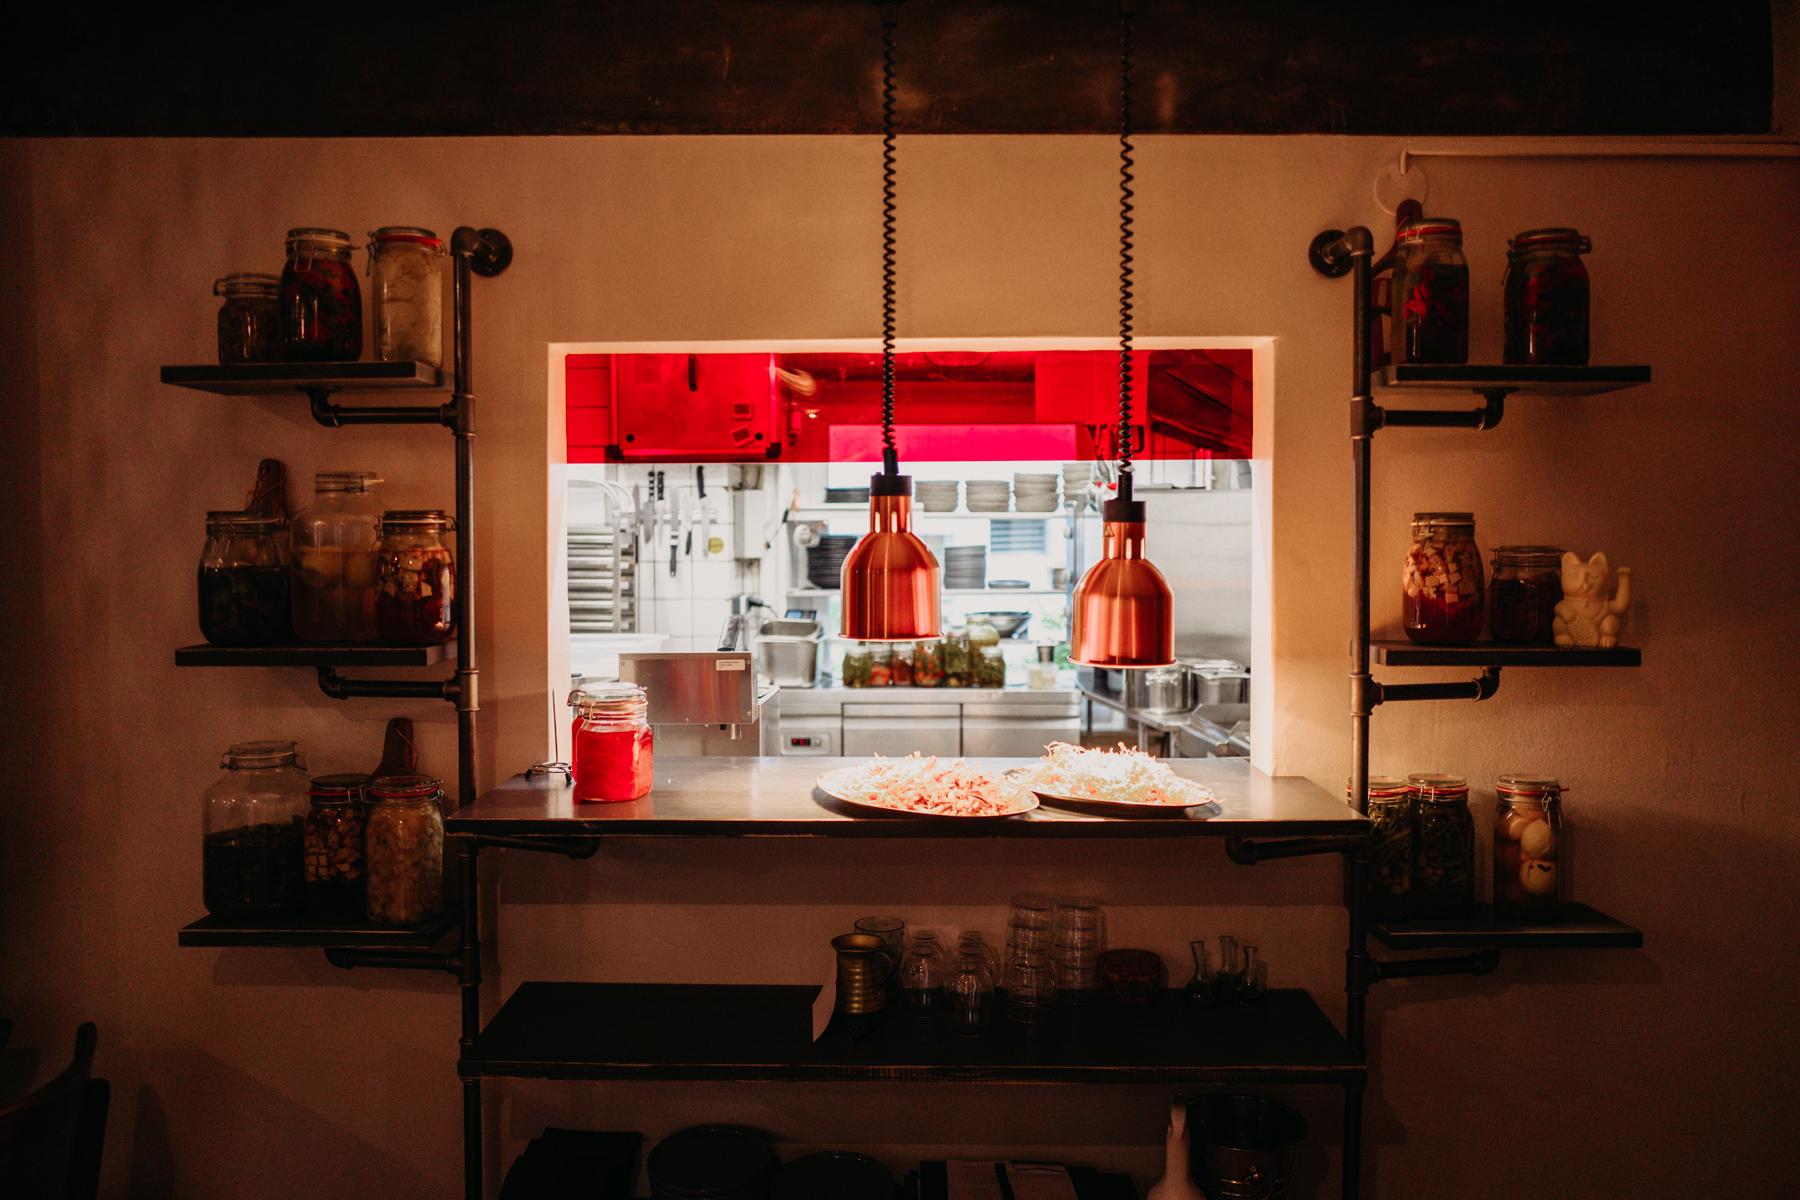 Geheimtipp Hamburg St Pauli Restaurant Maa' Deyo Dahlina Sophie Kock 17